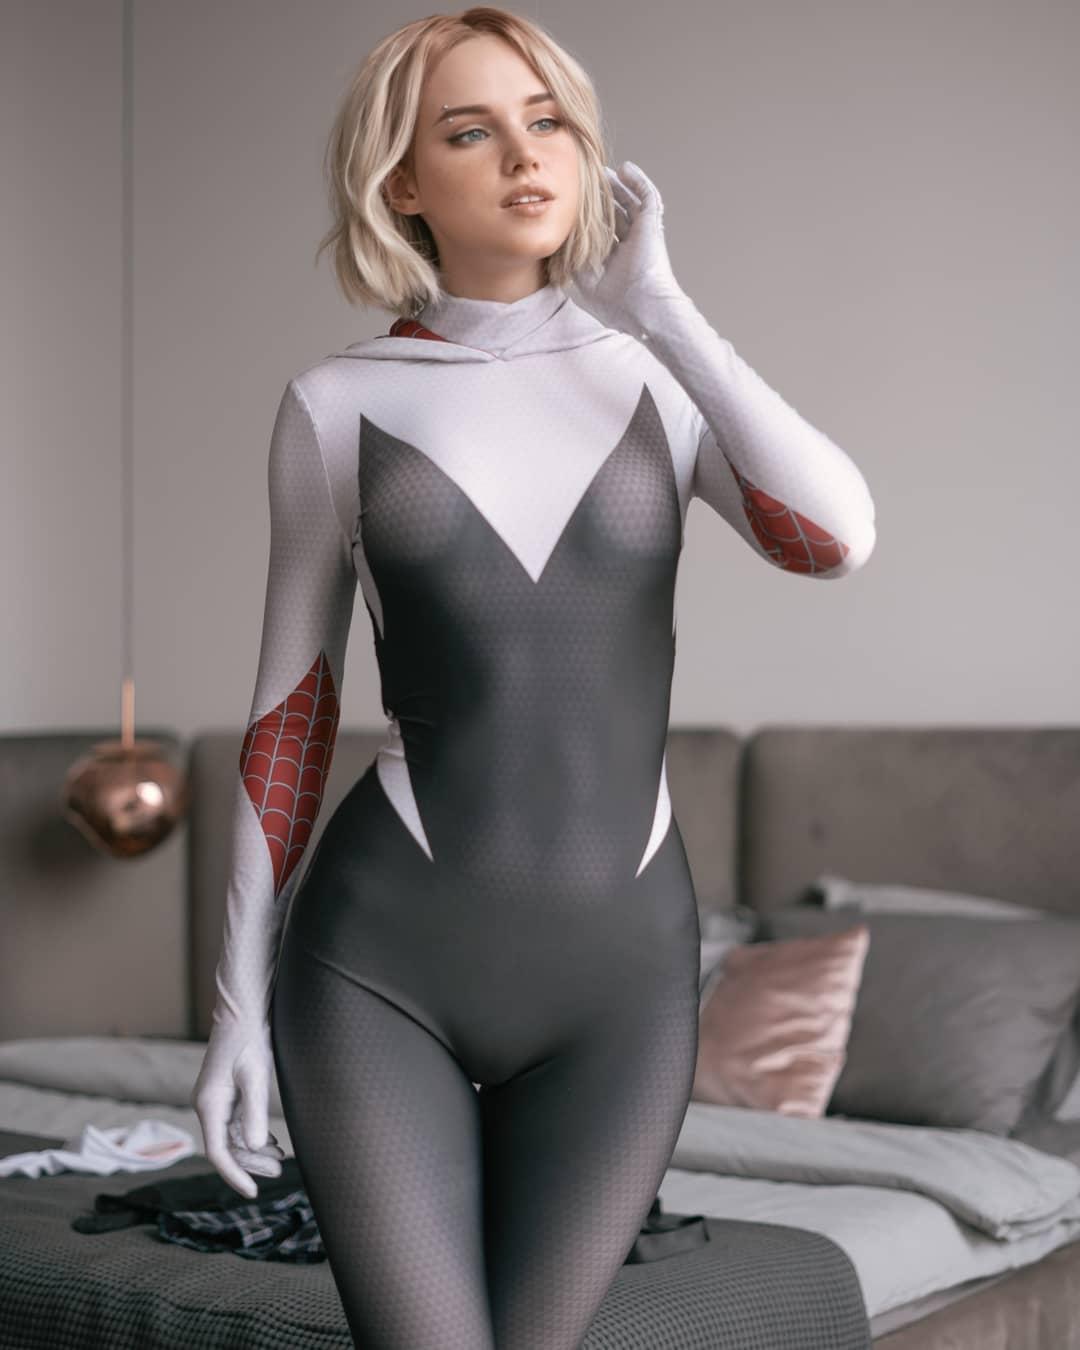 Gwen cosplay by cosplayer Shirogane Sama